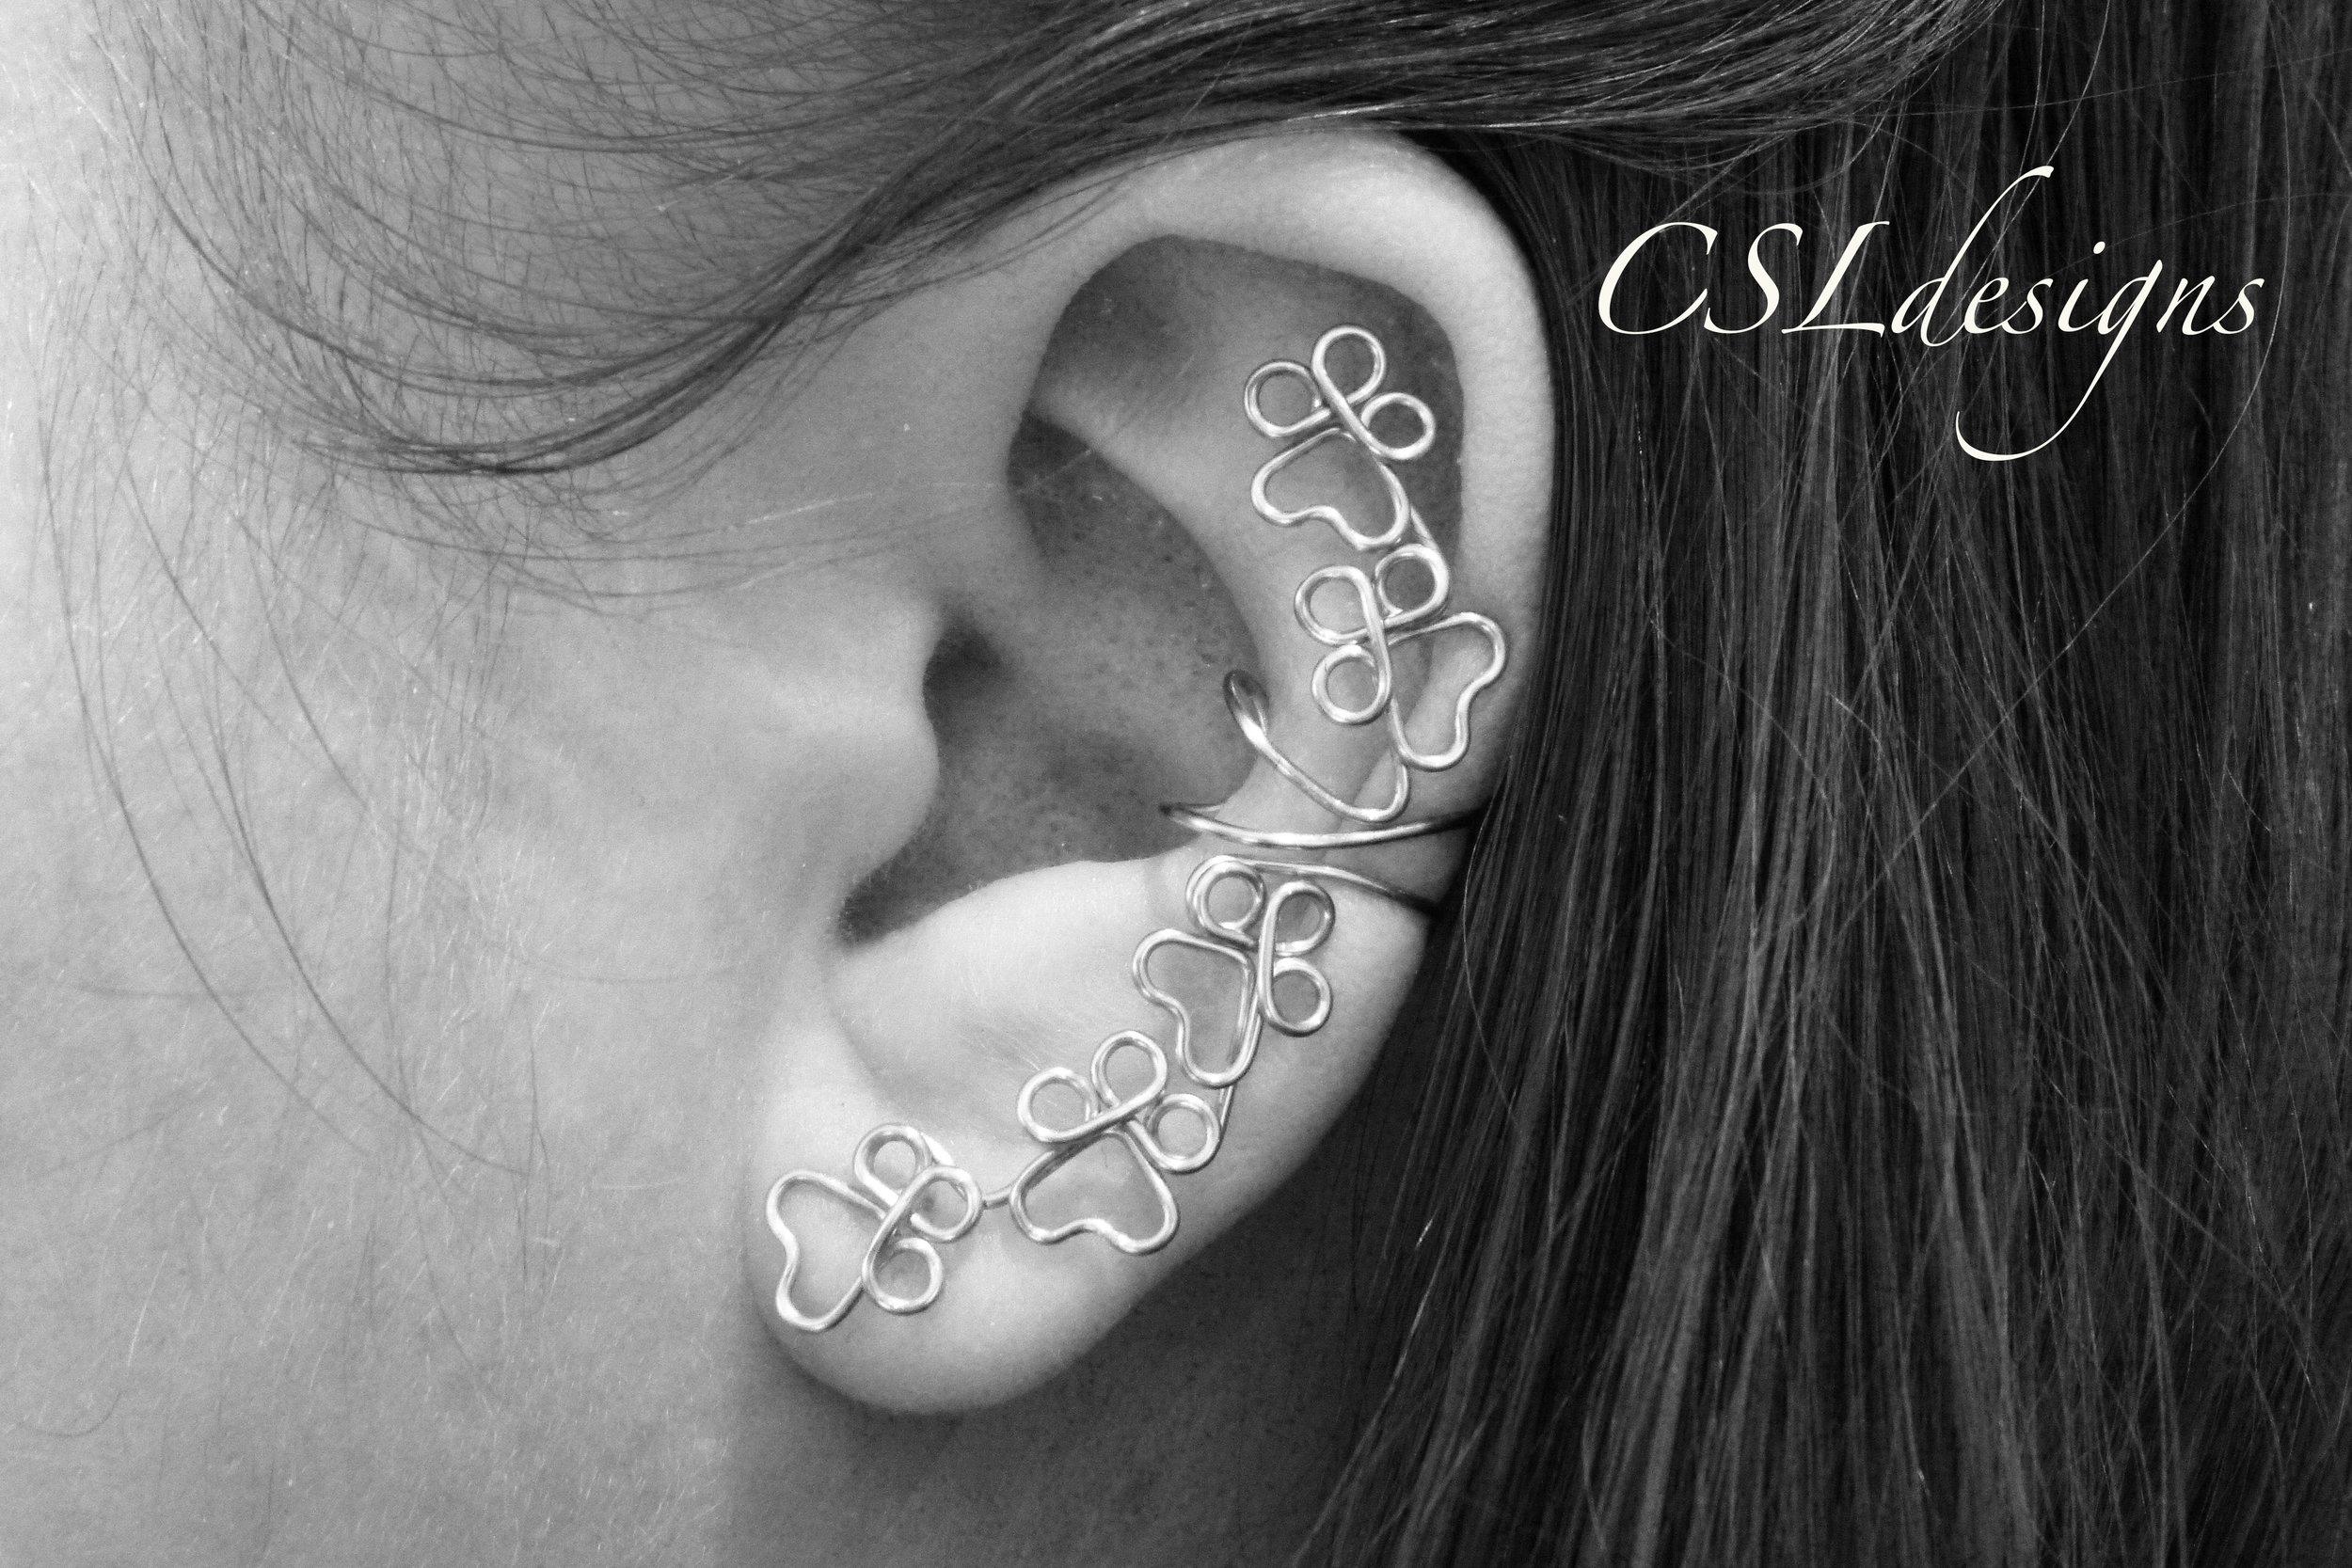 Paw prints wirework ear cuff thumbnail black and white 2.jpg